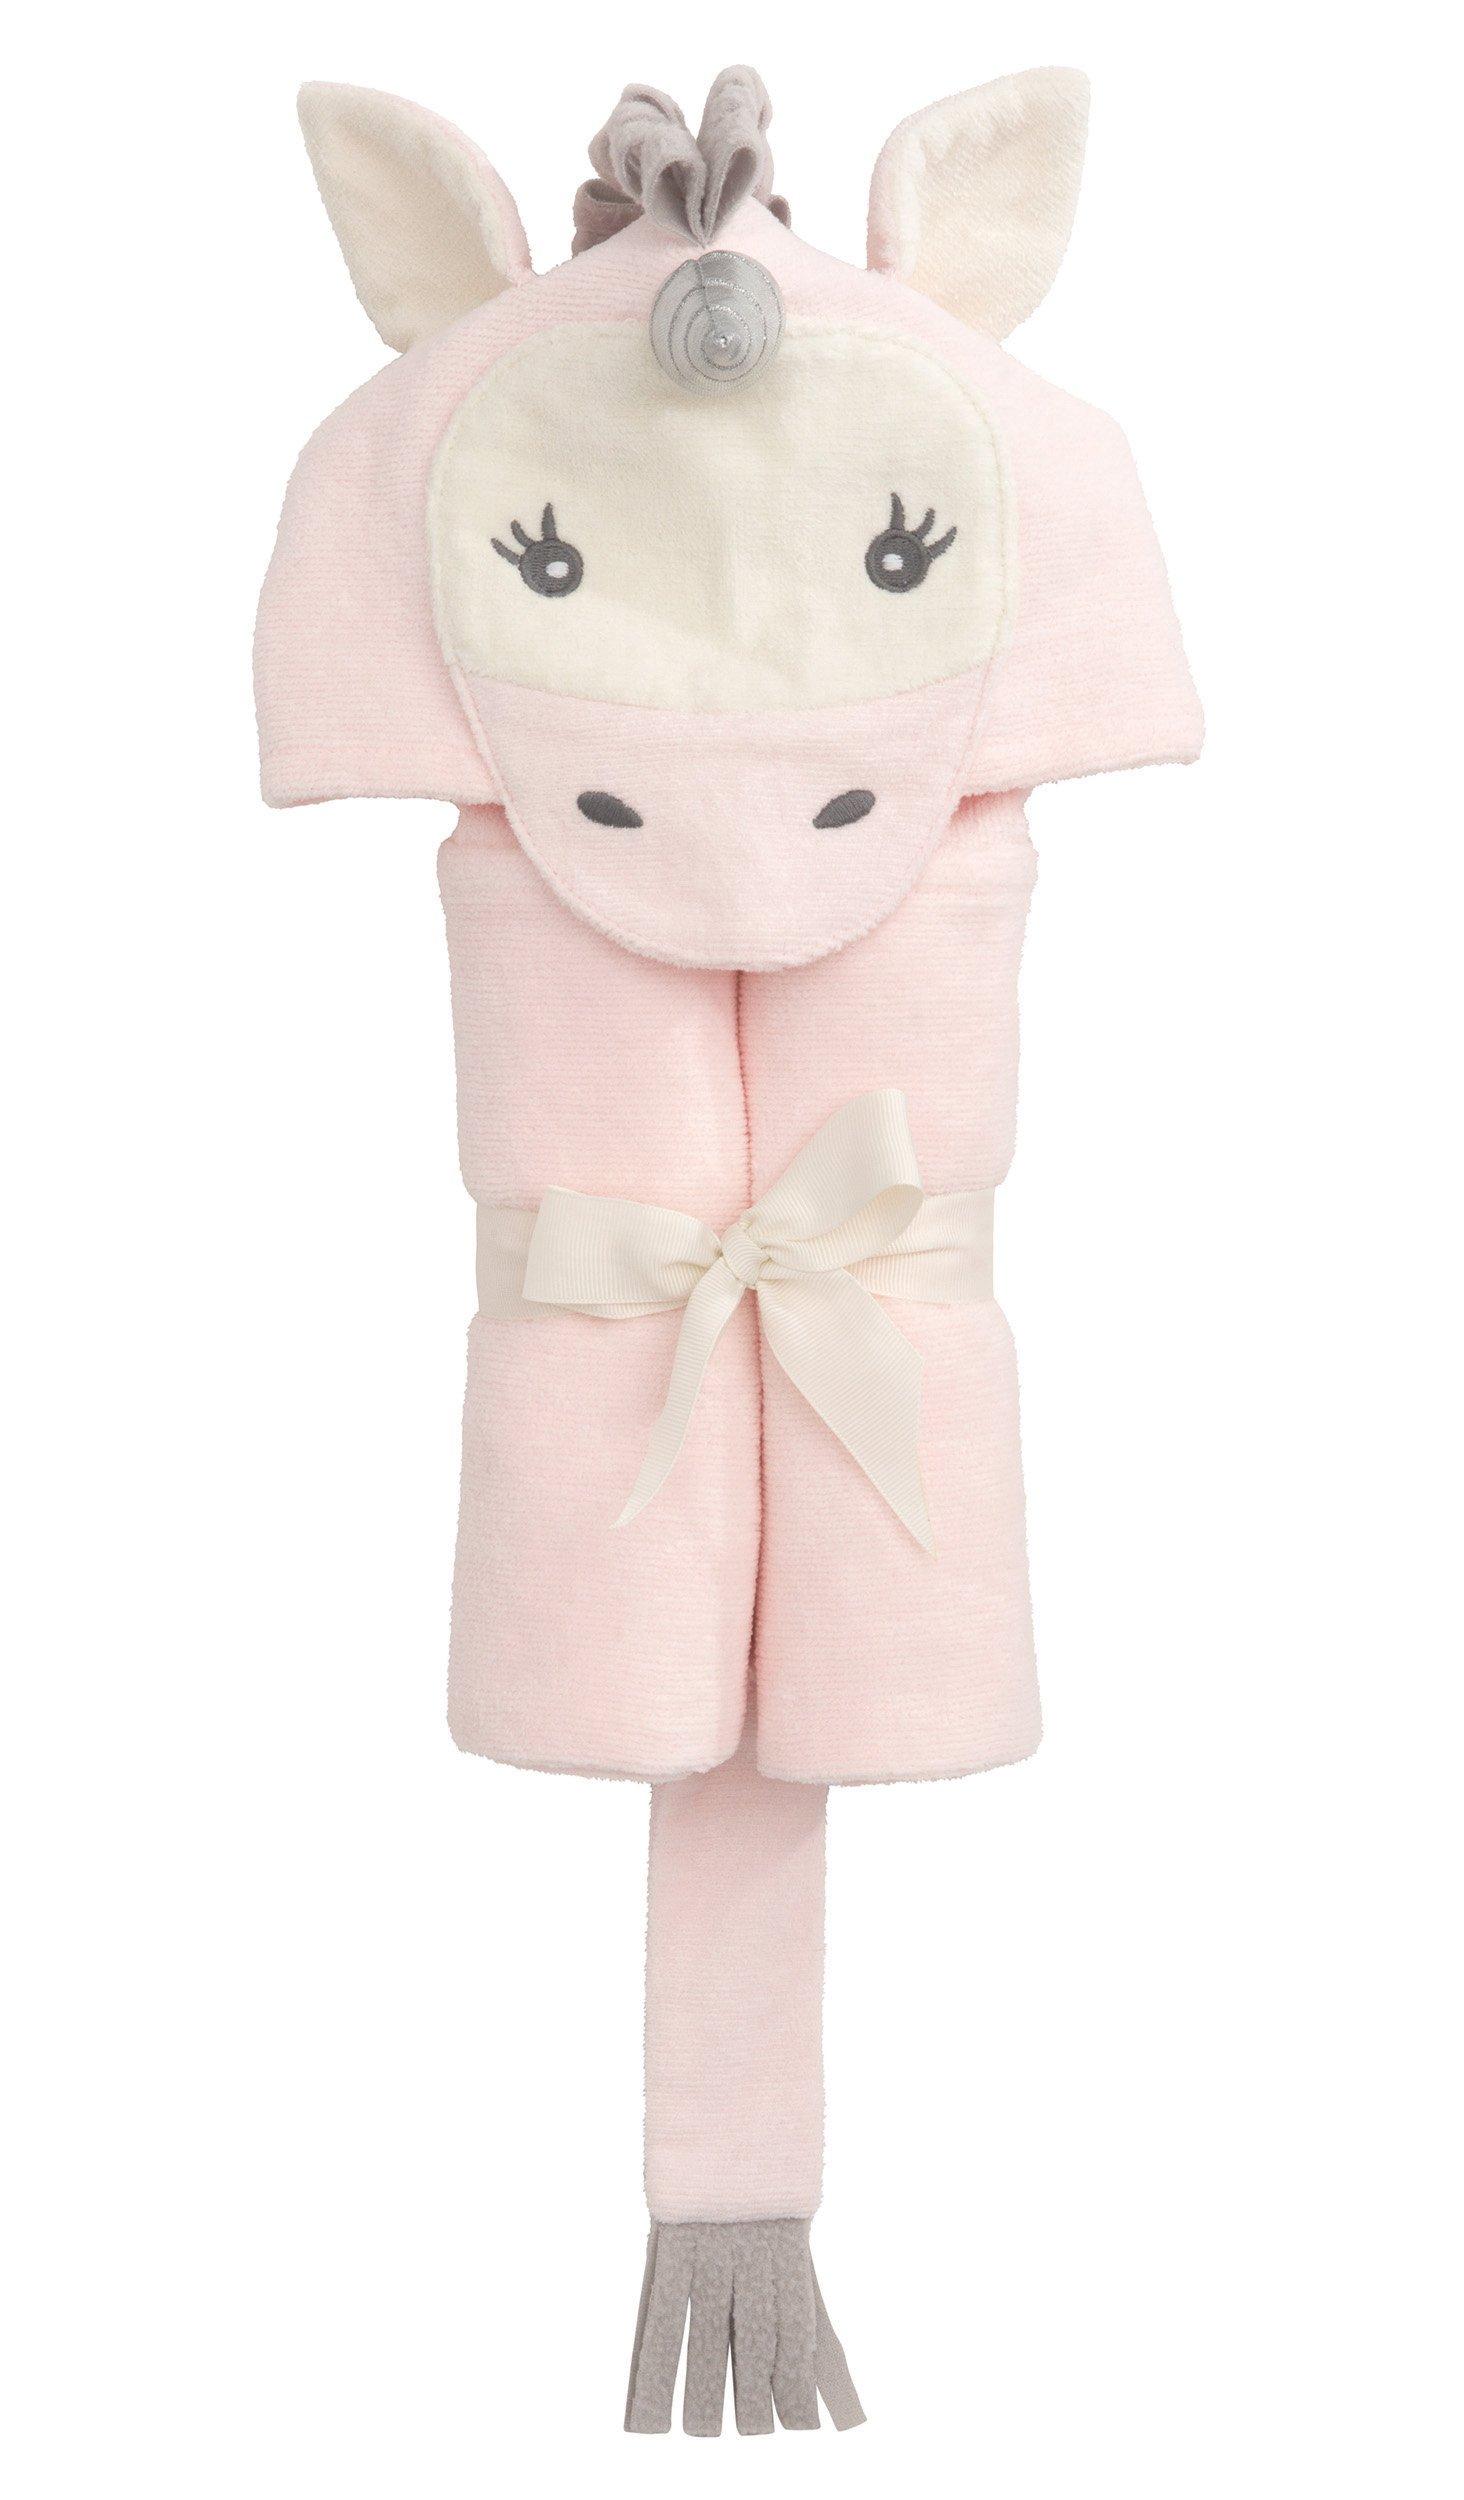 Elegant Baby Top Selling  Bath Gift - Cotton Hooded Towel Wrap, Cute Pink Unicorn by Elegant Baby